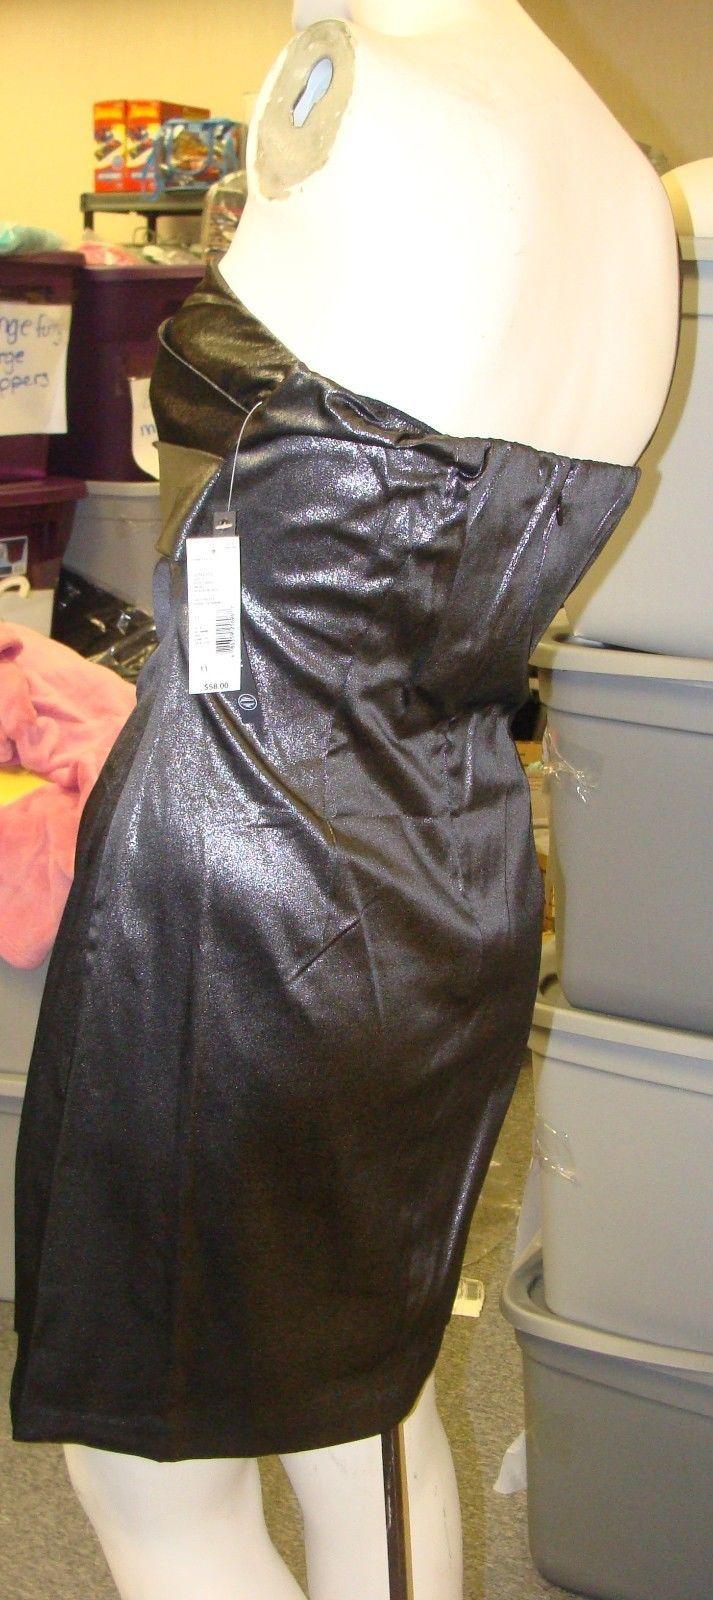 NEW WOMENS JUNIORS JRs SIZE 11 BLACK SILVER FAUX LEATHER METALLIC 1 STRAP DRESS